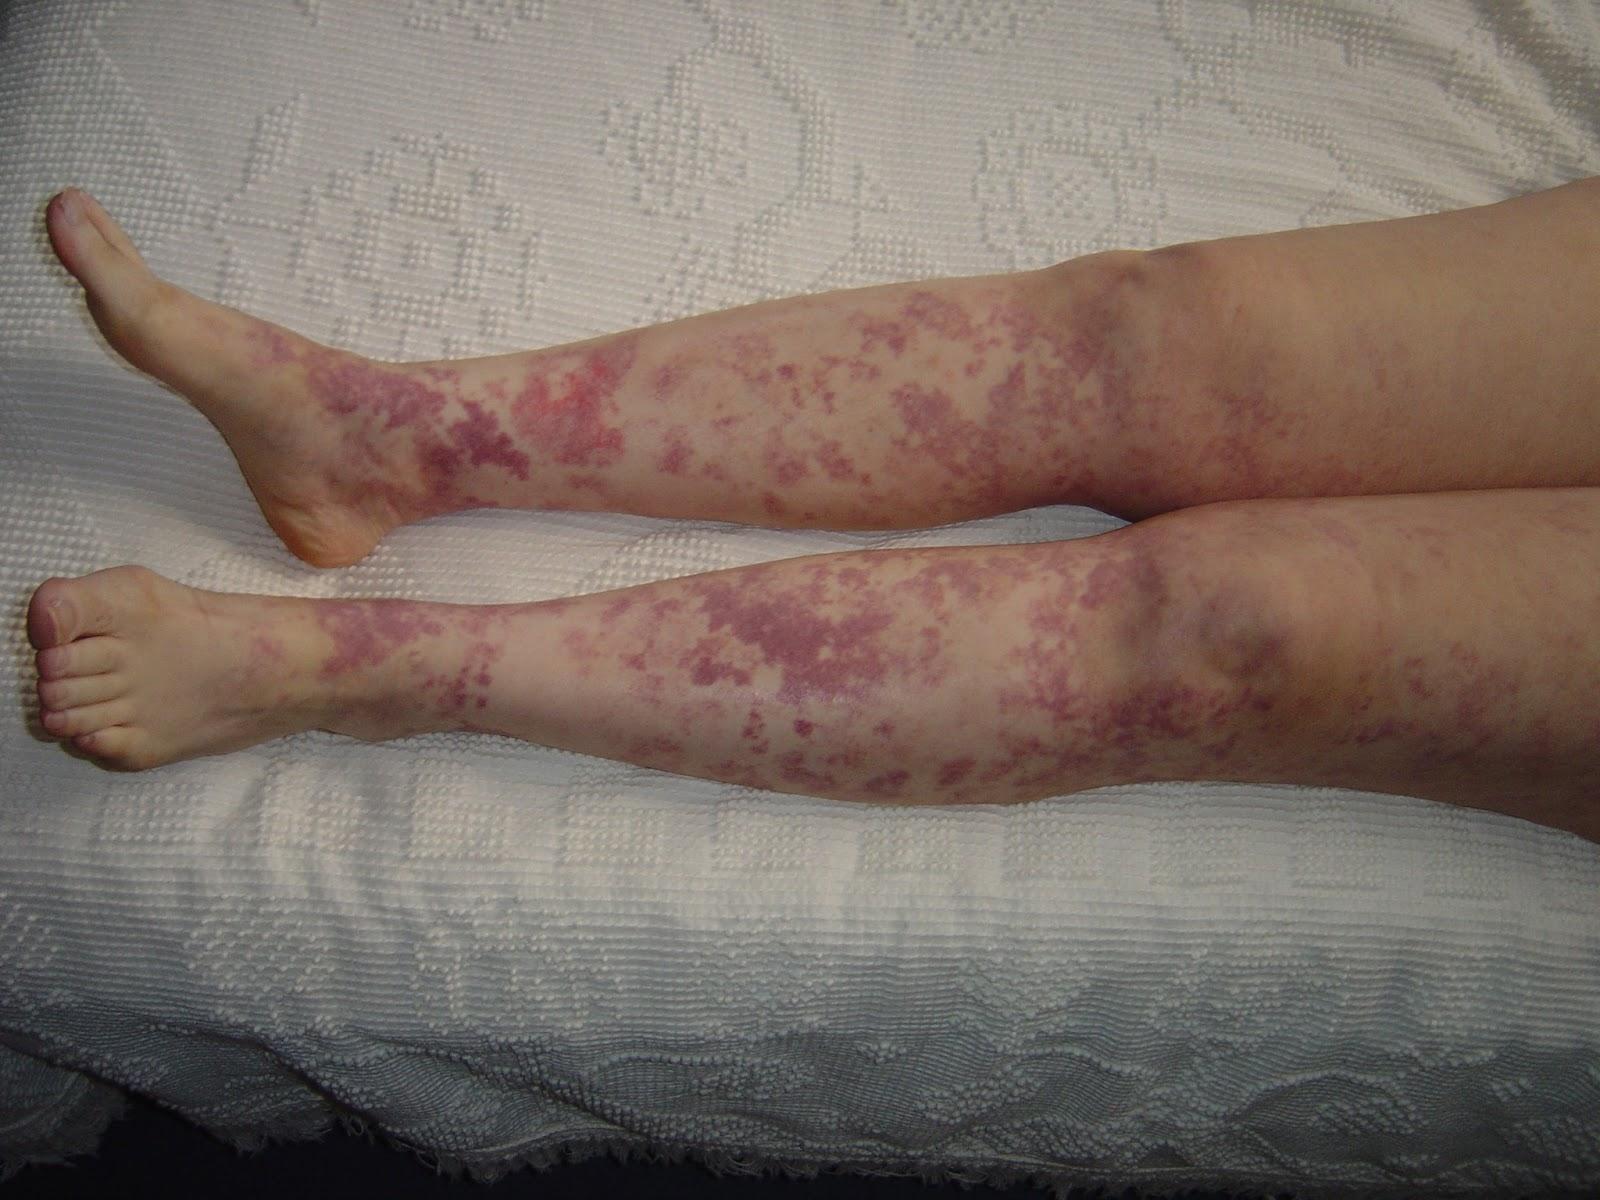 rash legs